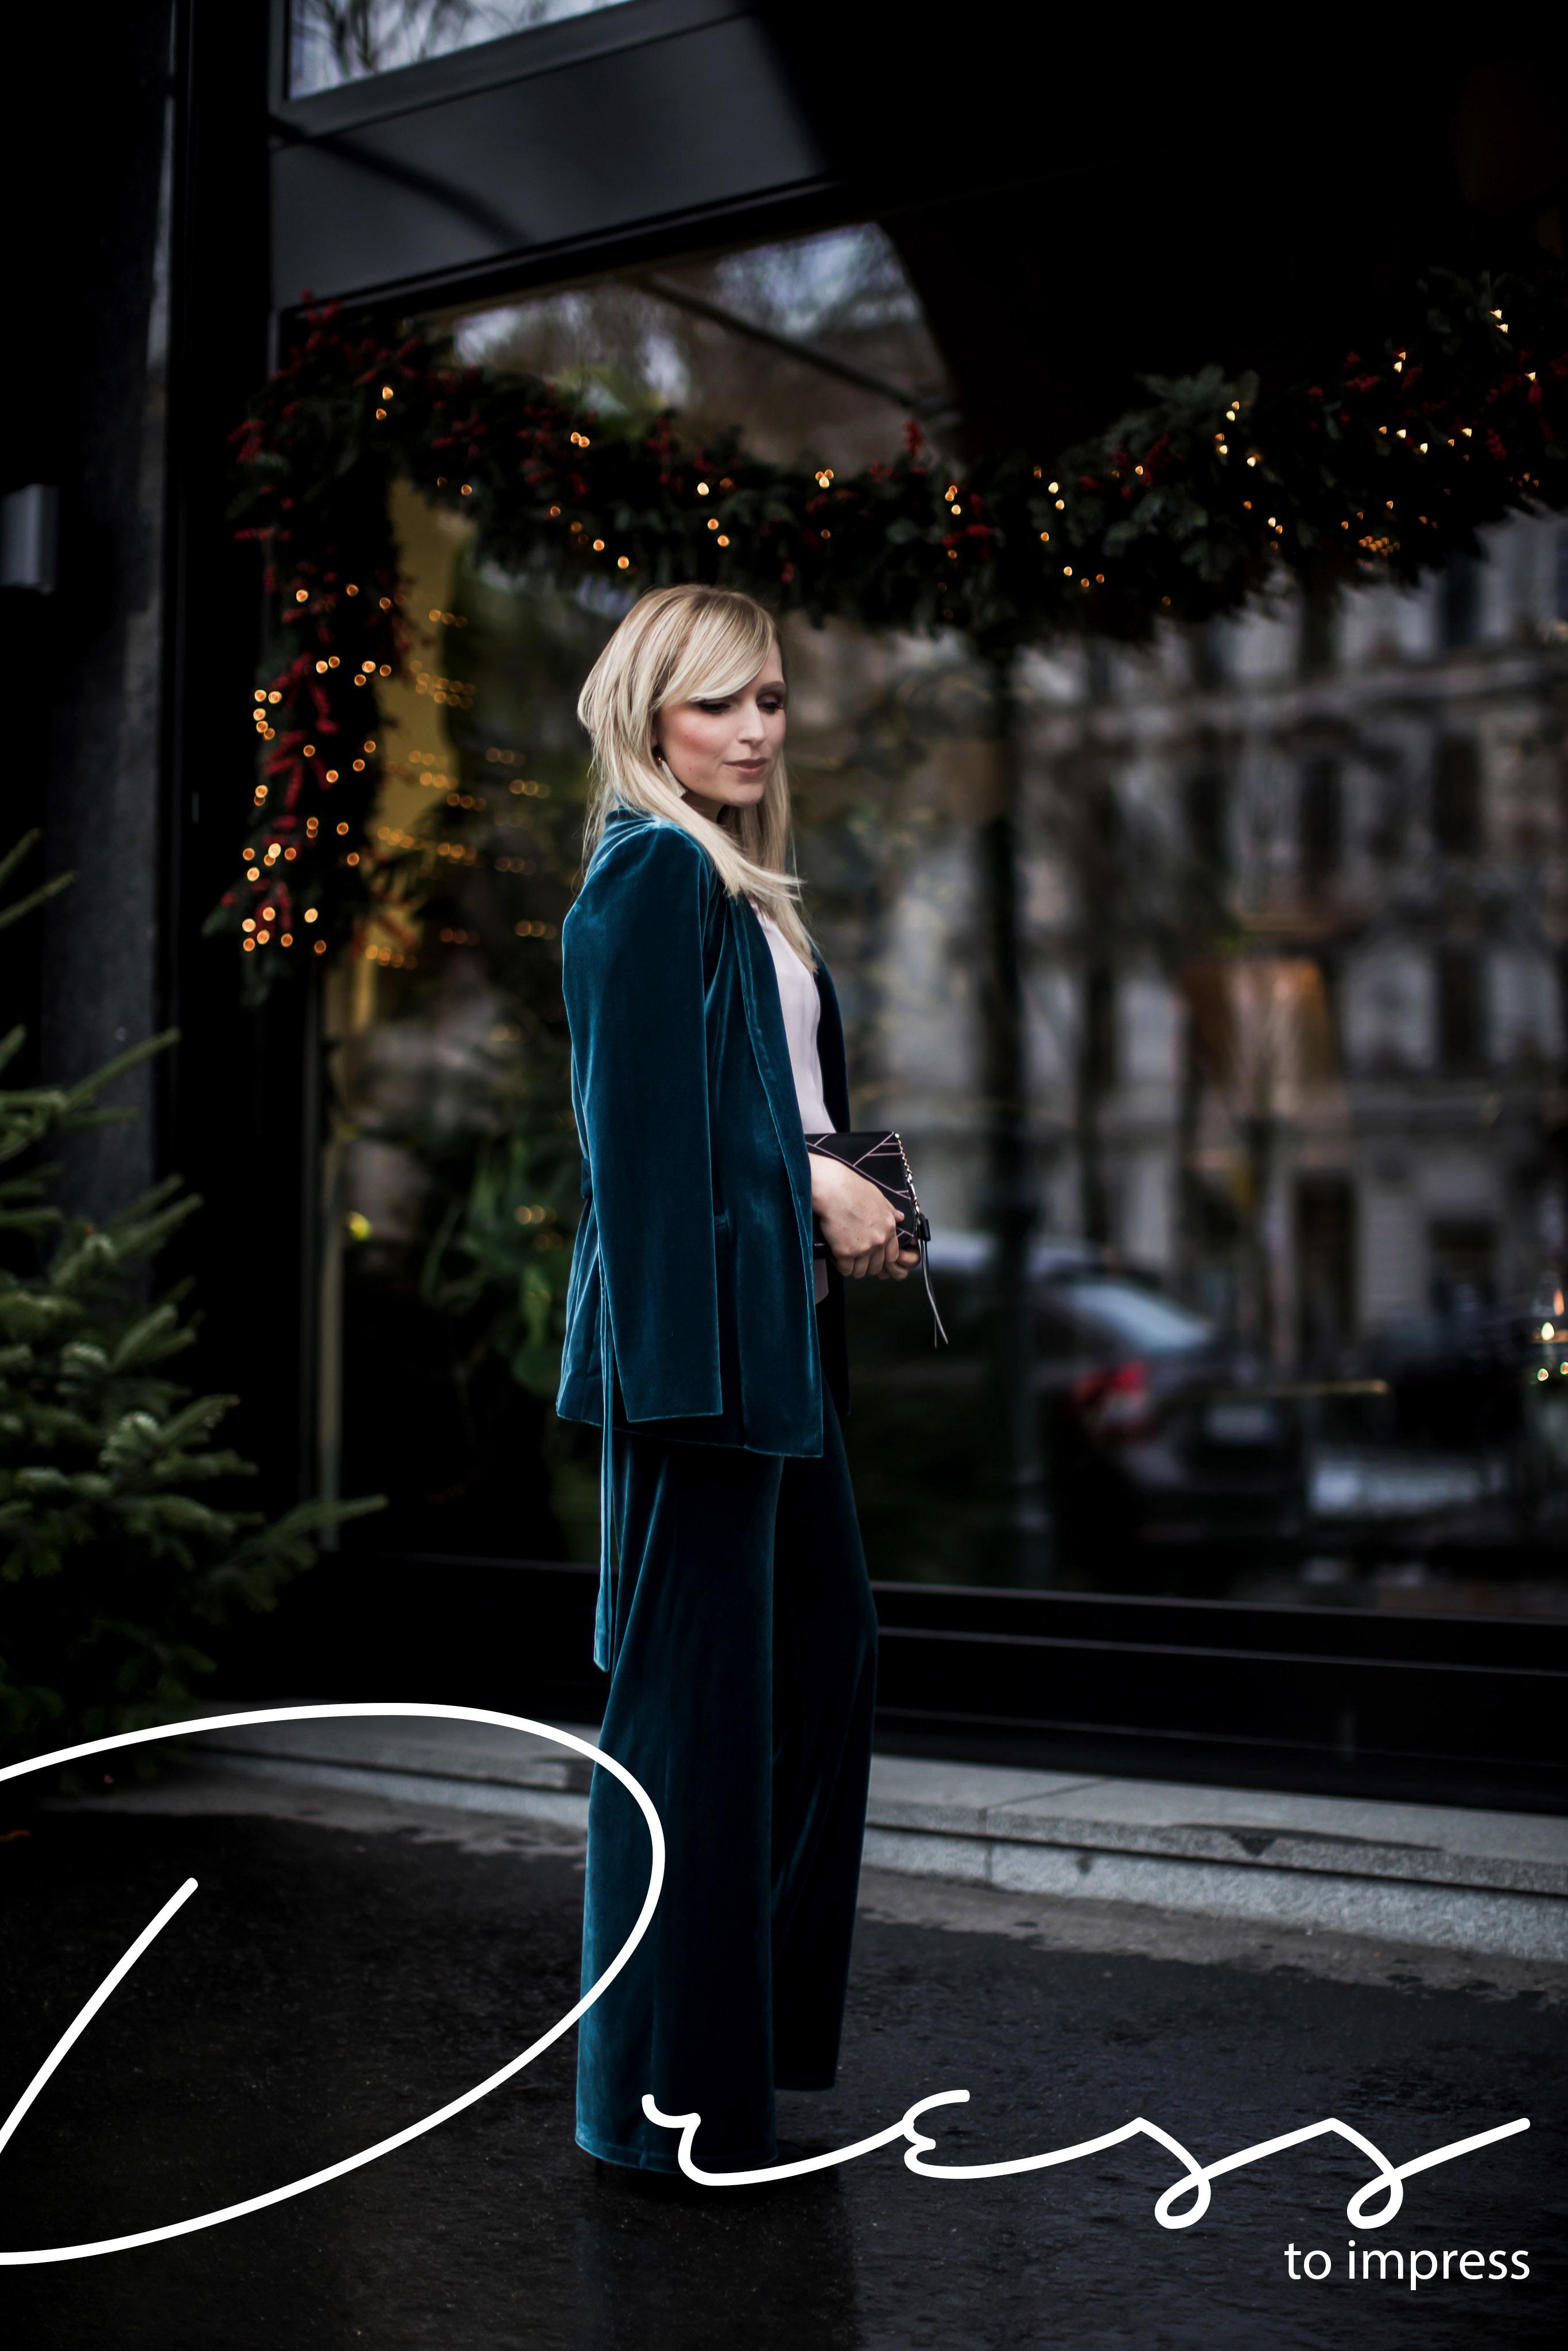 A perfect Night out - Dress to impress in einem Samtanzug